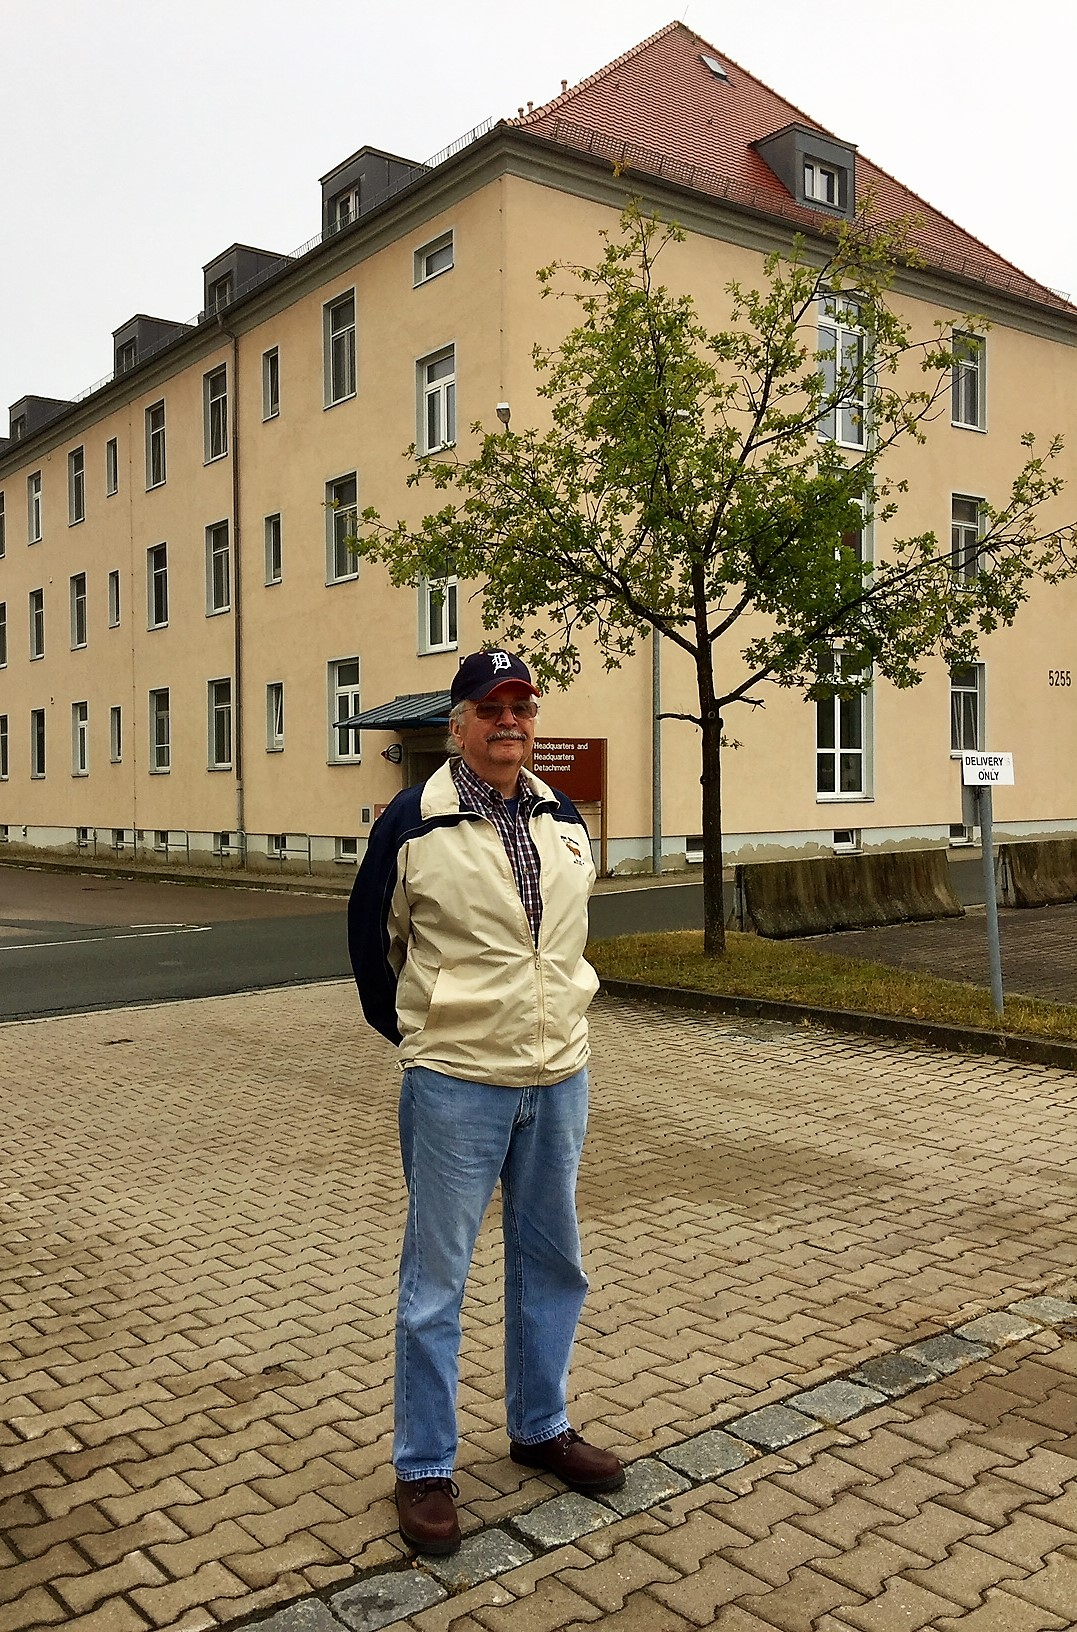 U.S. Army veteran visits Barton Barracks after nearly 60